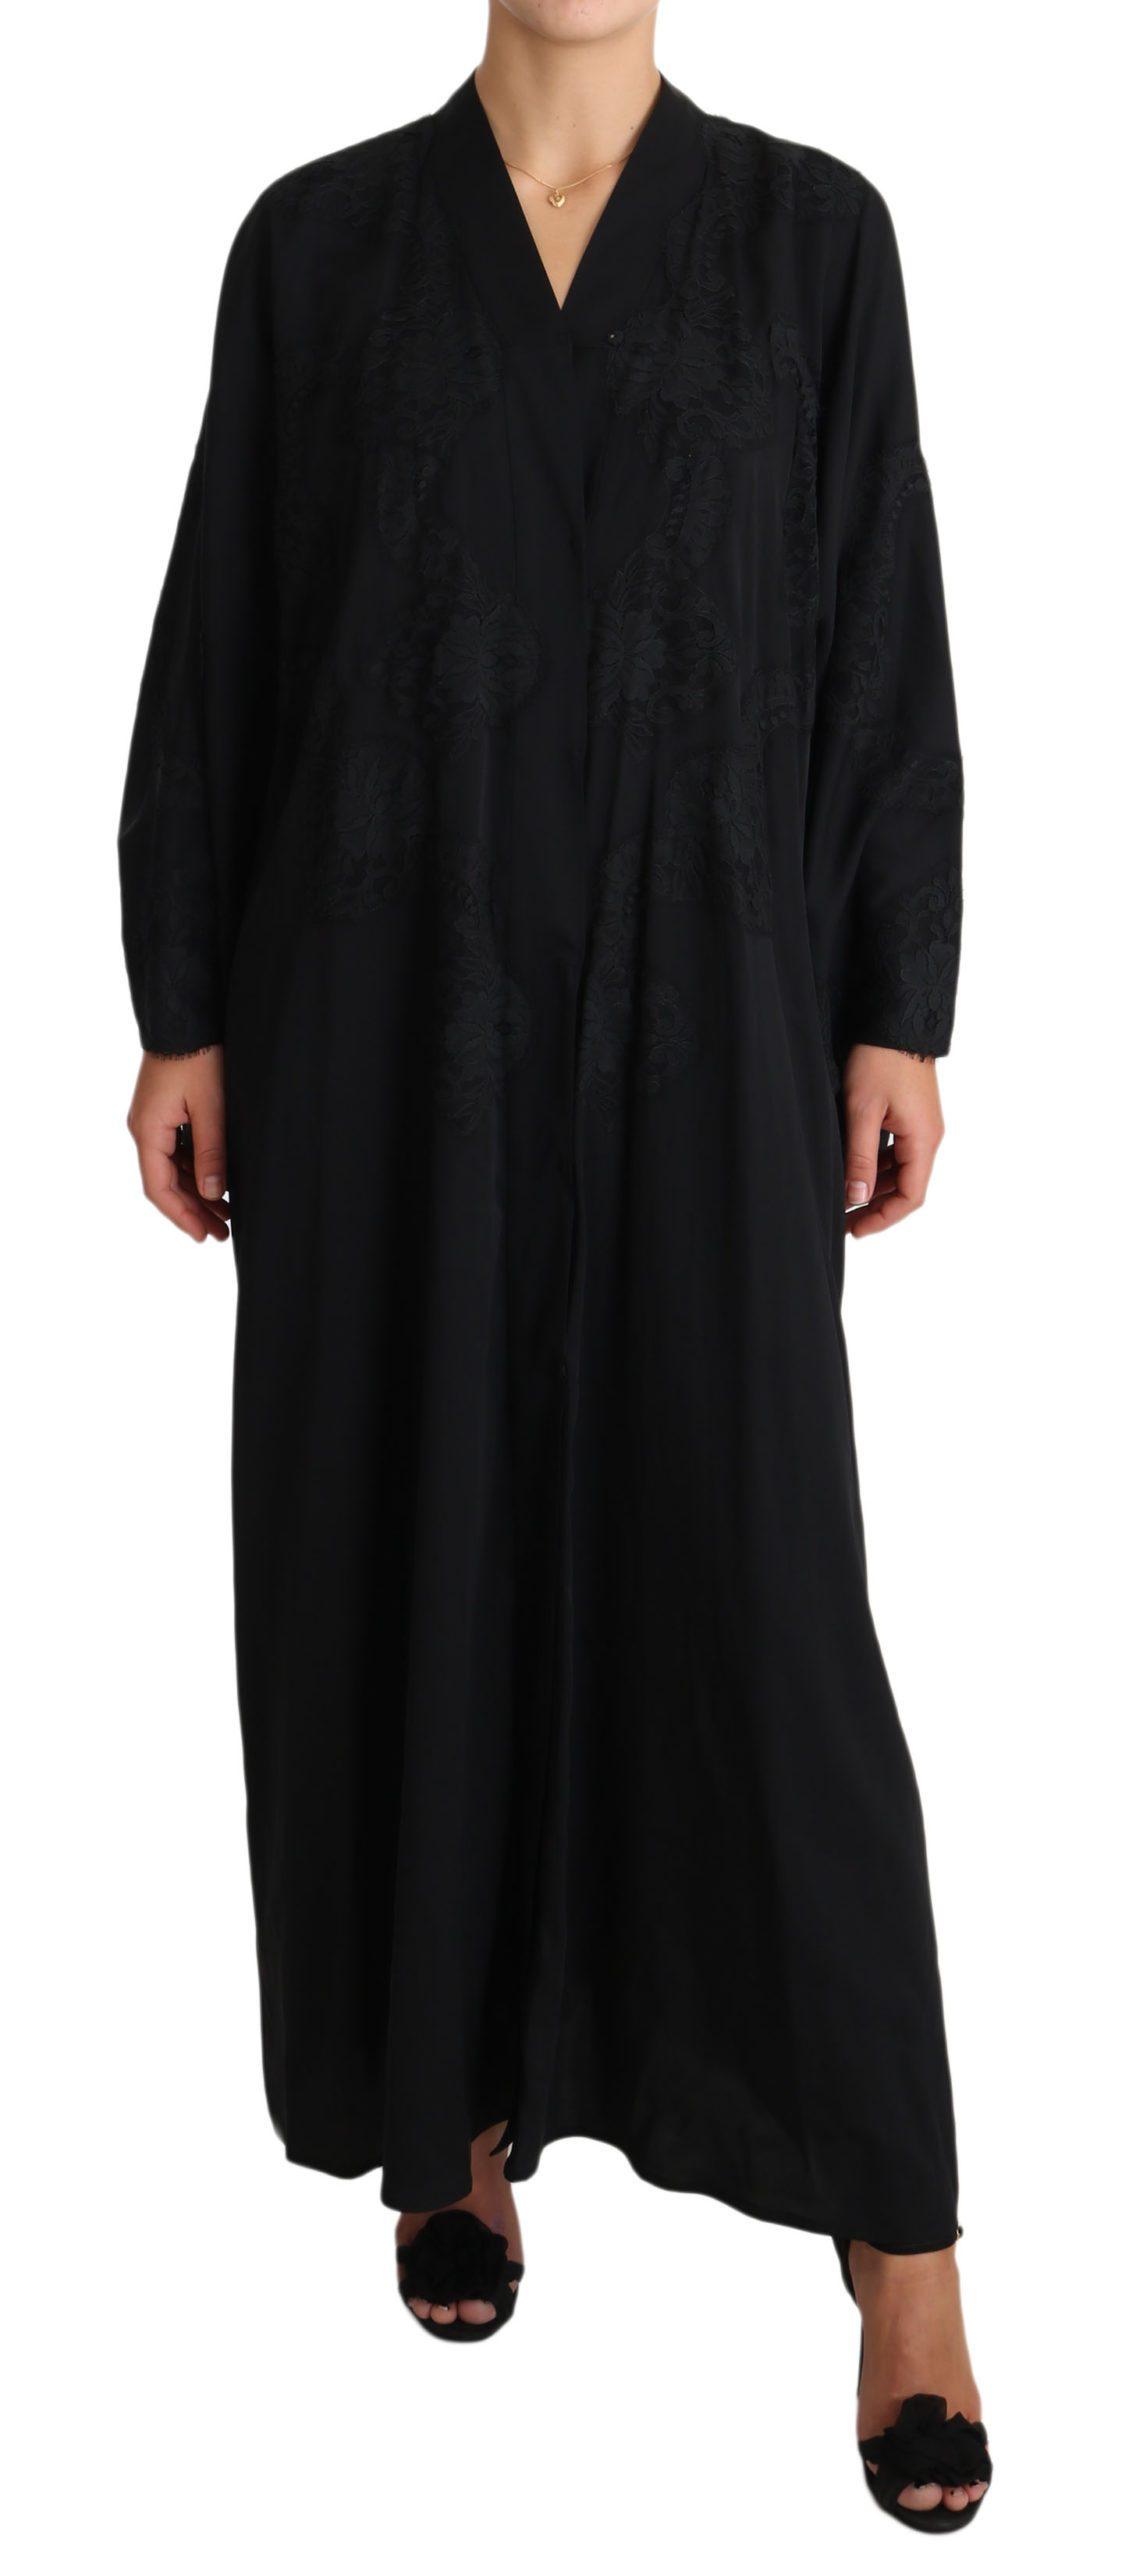 Dolce & Gabbana Women's Dress Black DR1902 - IT42|M